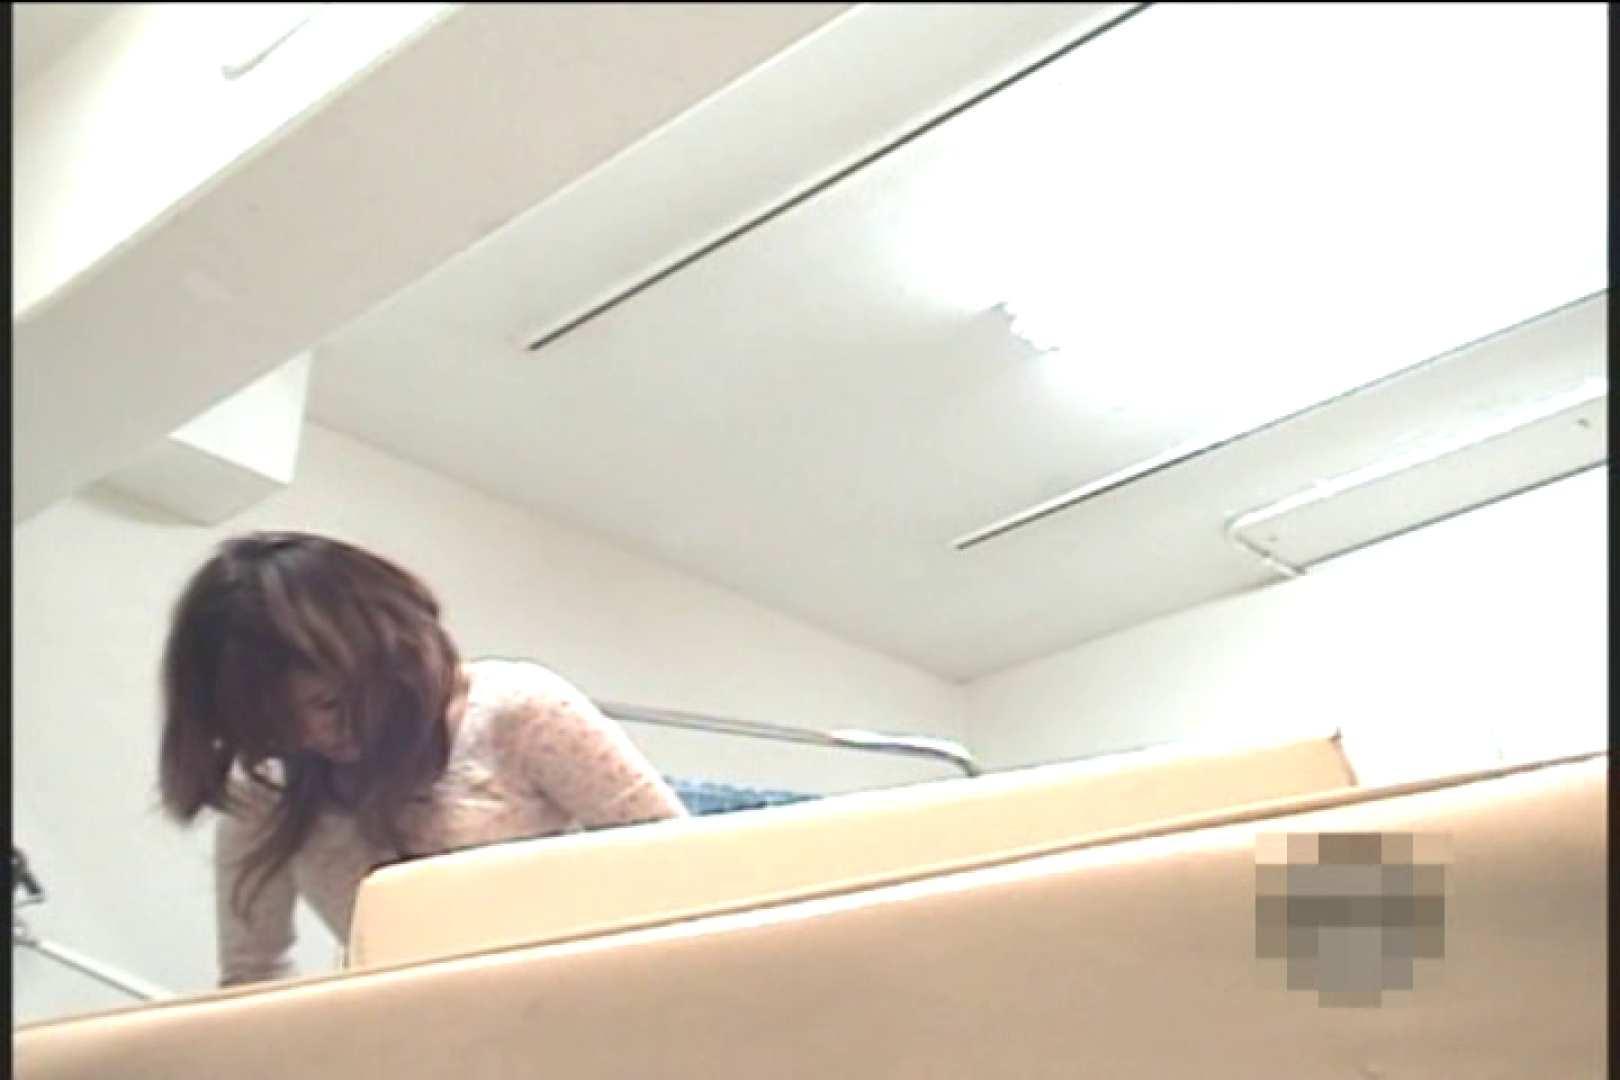 逆噴射病院 肛門科Vol.3 セックス流出映像 スケベ動画紹介 49連発 43